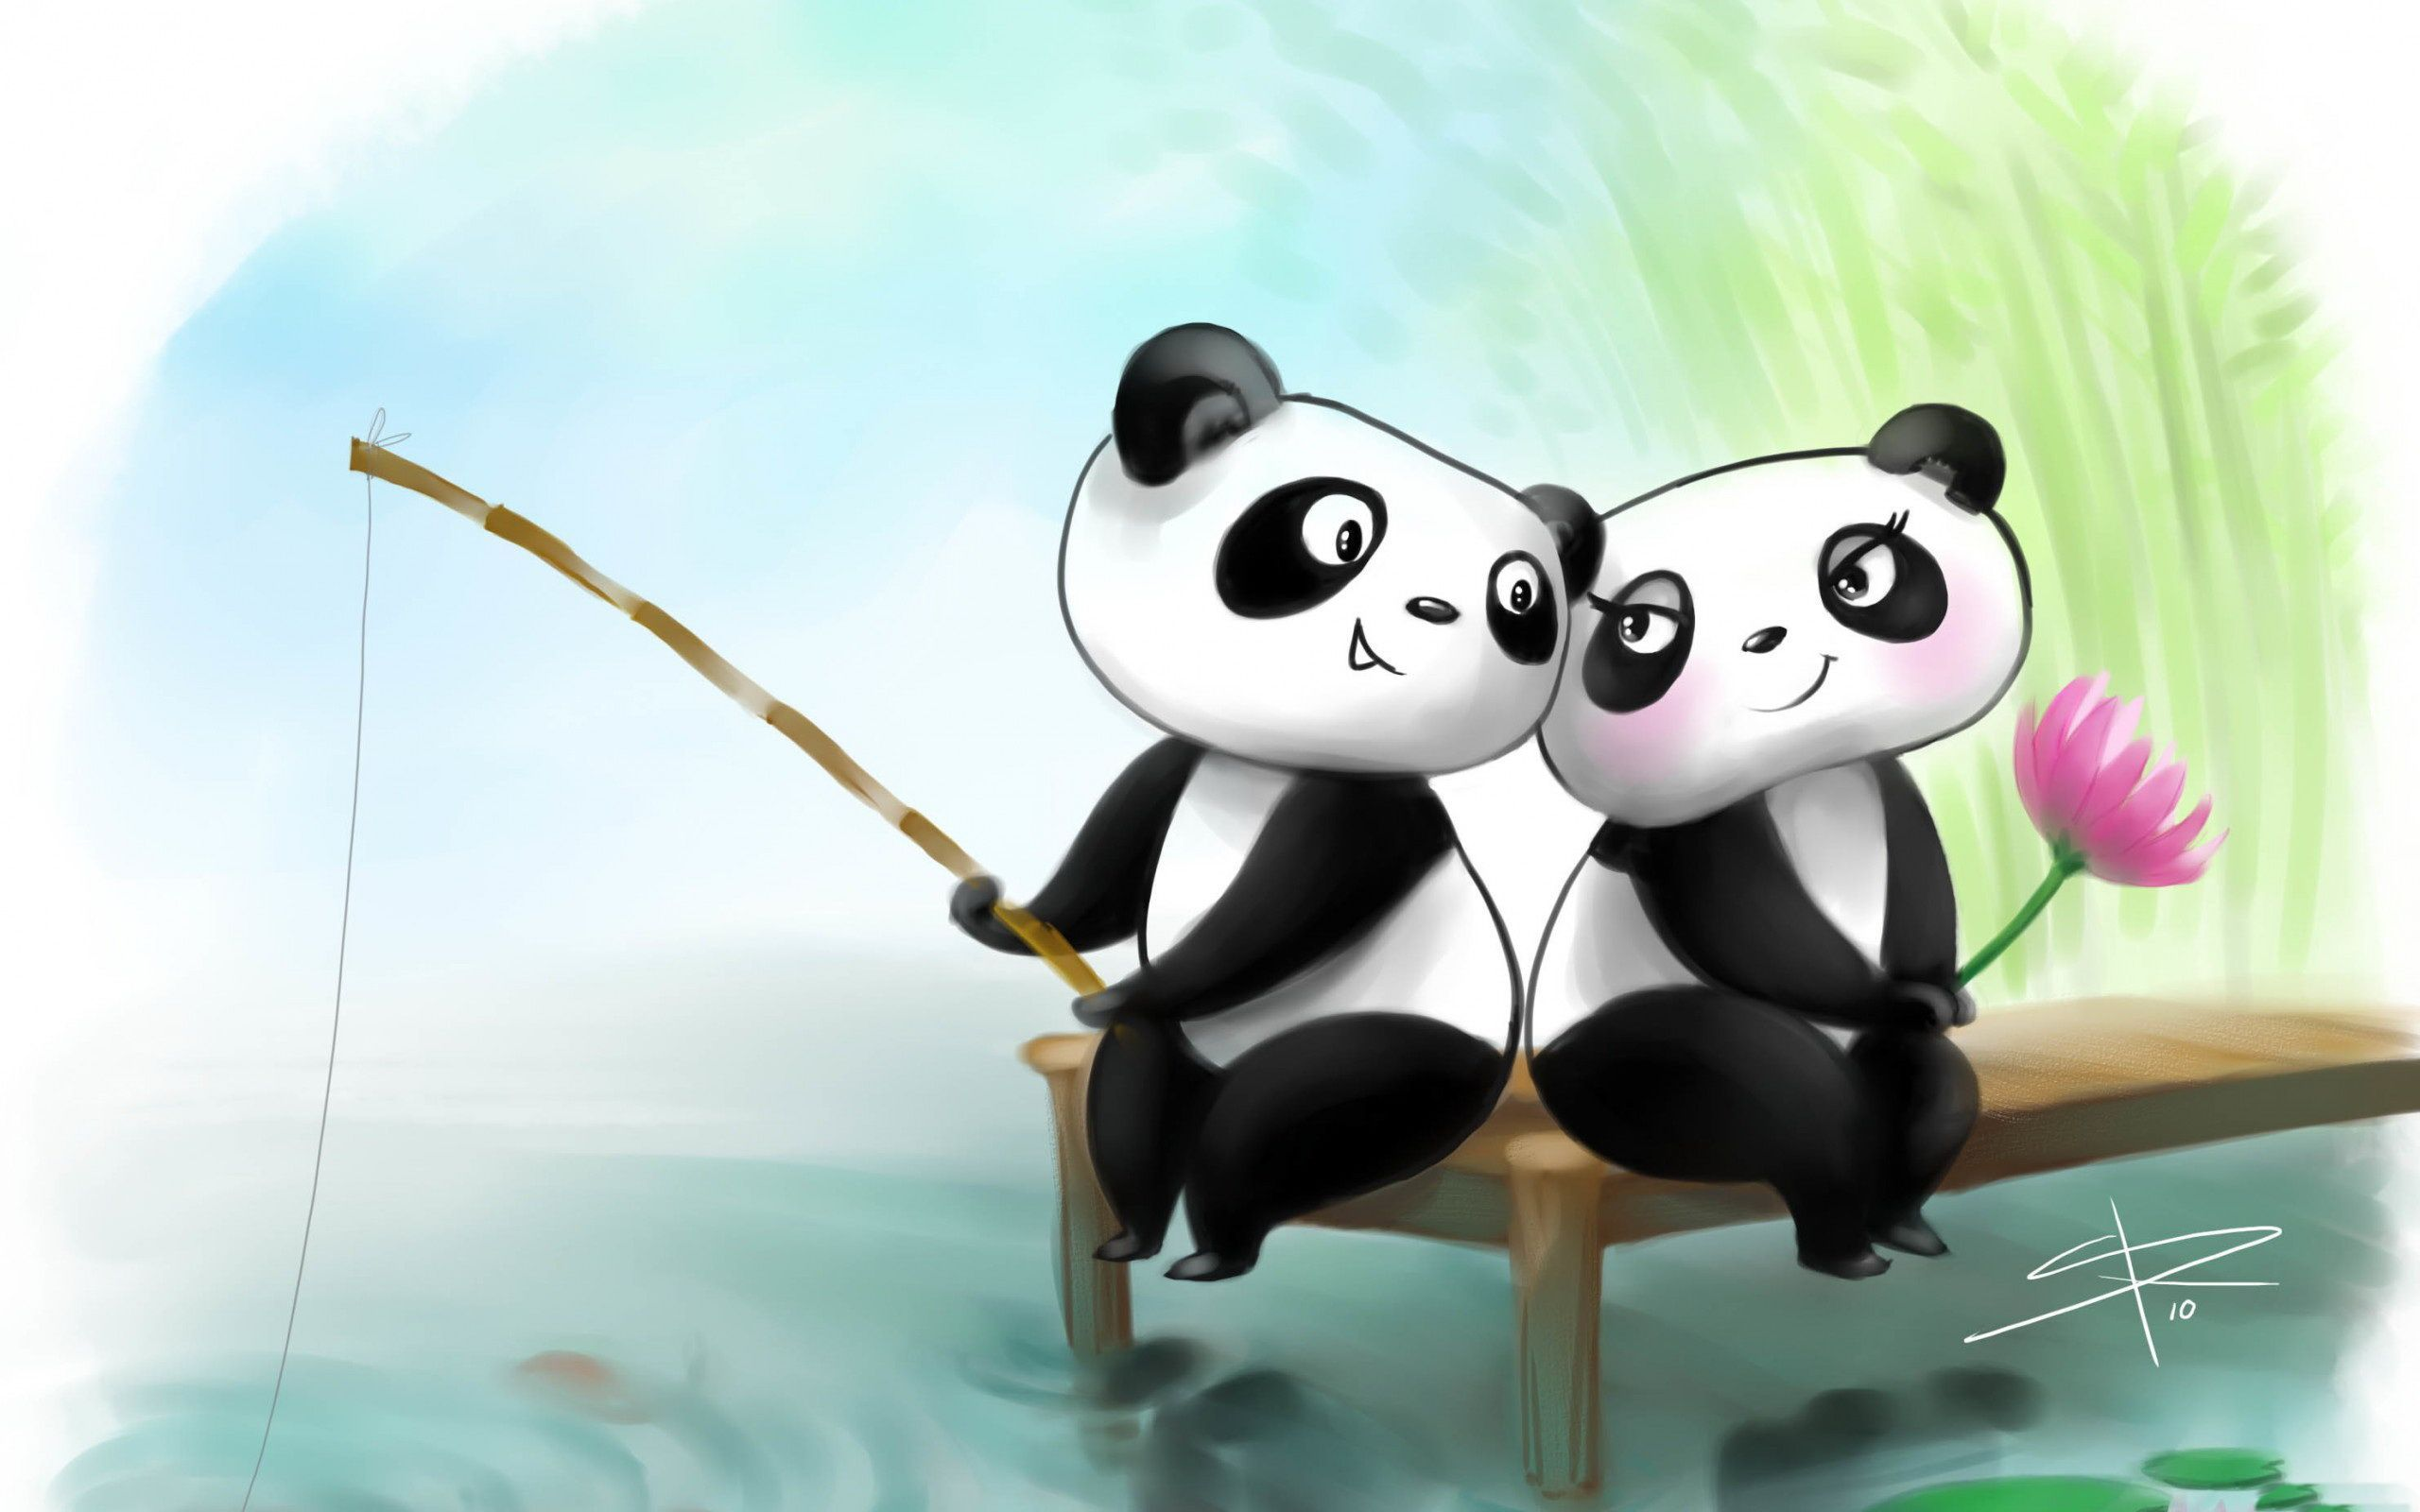 Cute Cartoon Couple Wallpapers Wallpaper Cave Panda Wallpapers Cute Couple Wallpaper Cute Laptop Wallpaper